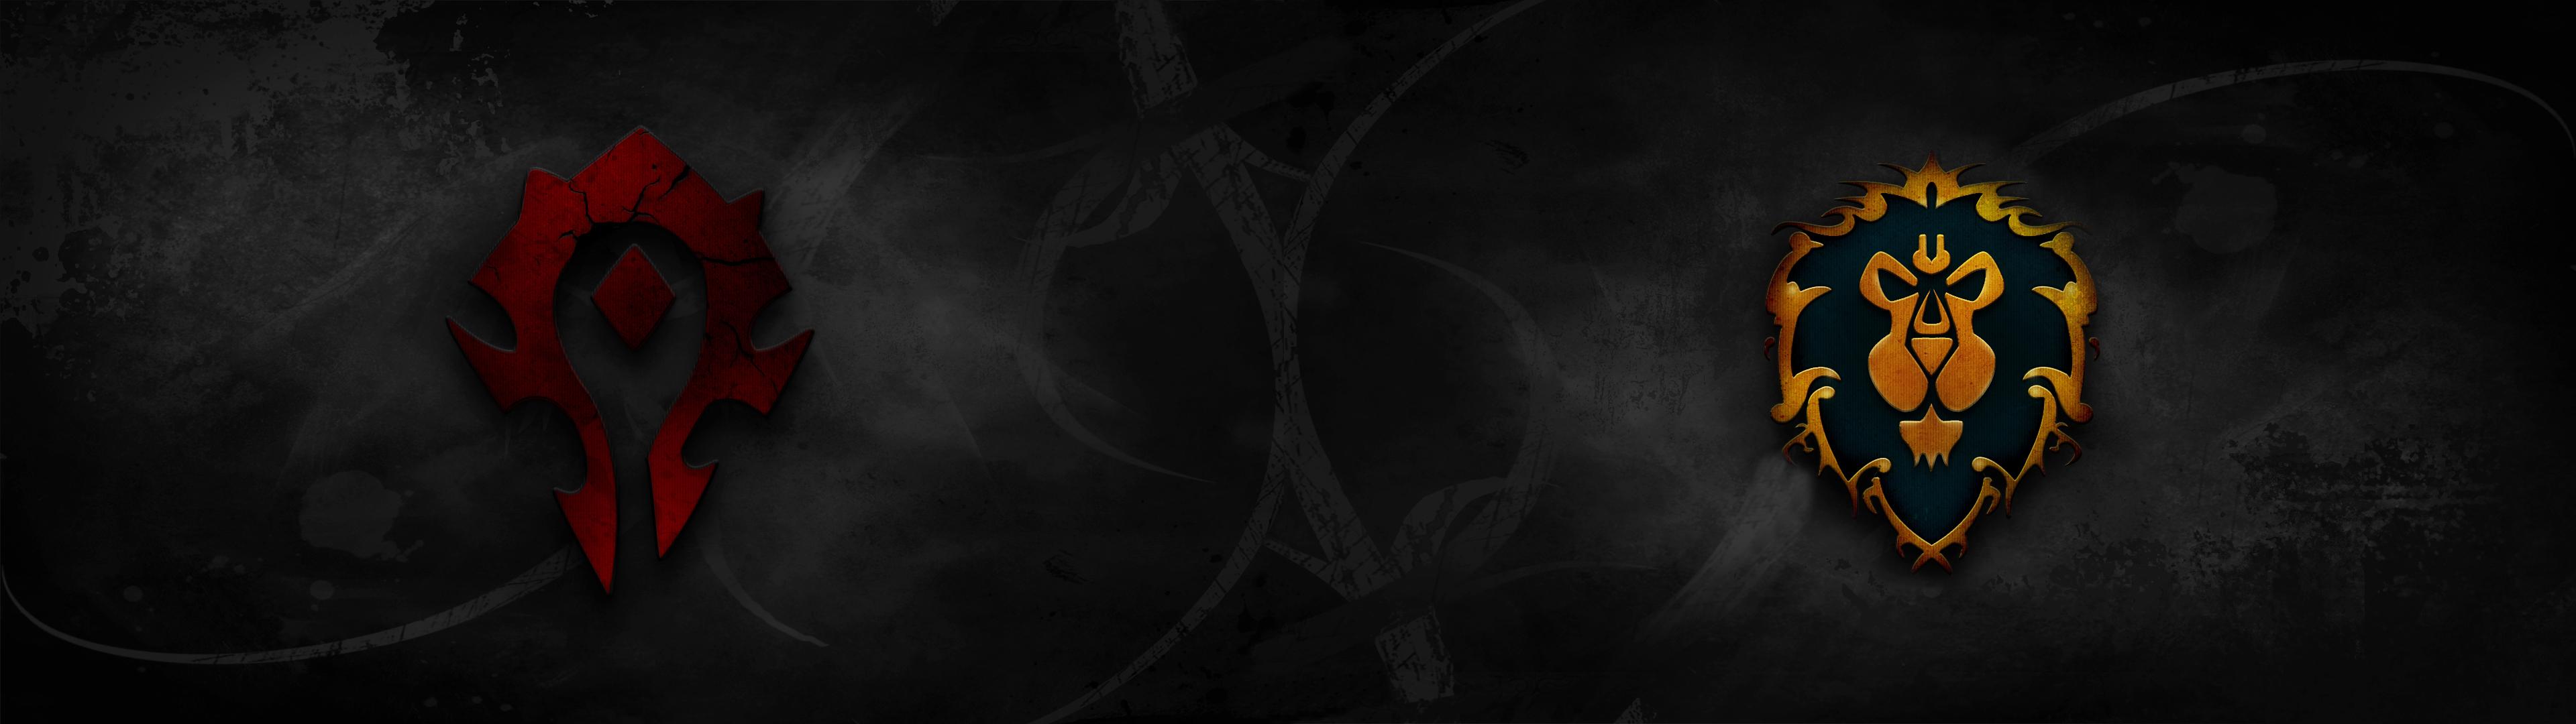 world of warcraft - horde alliance dual screen hdjrkdo on deviantart